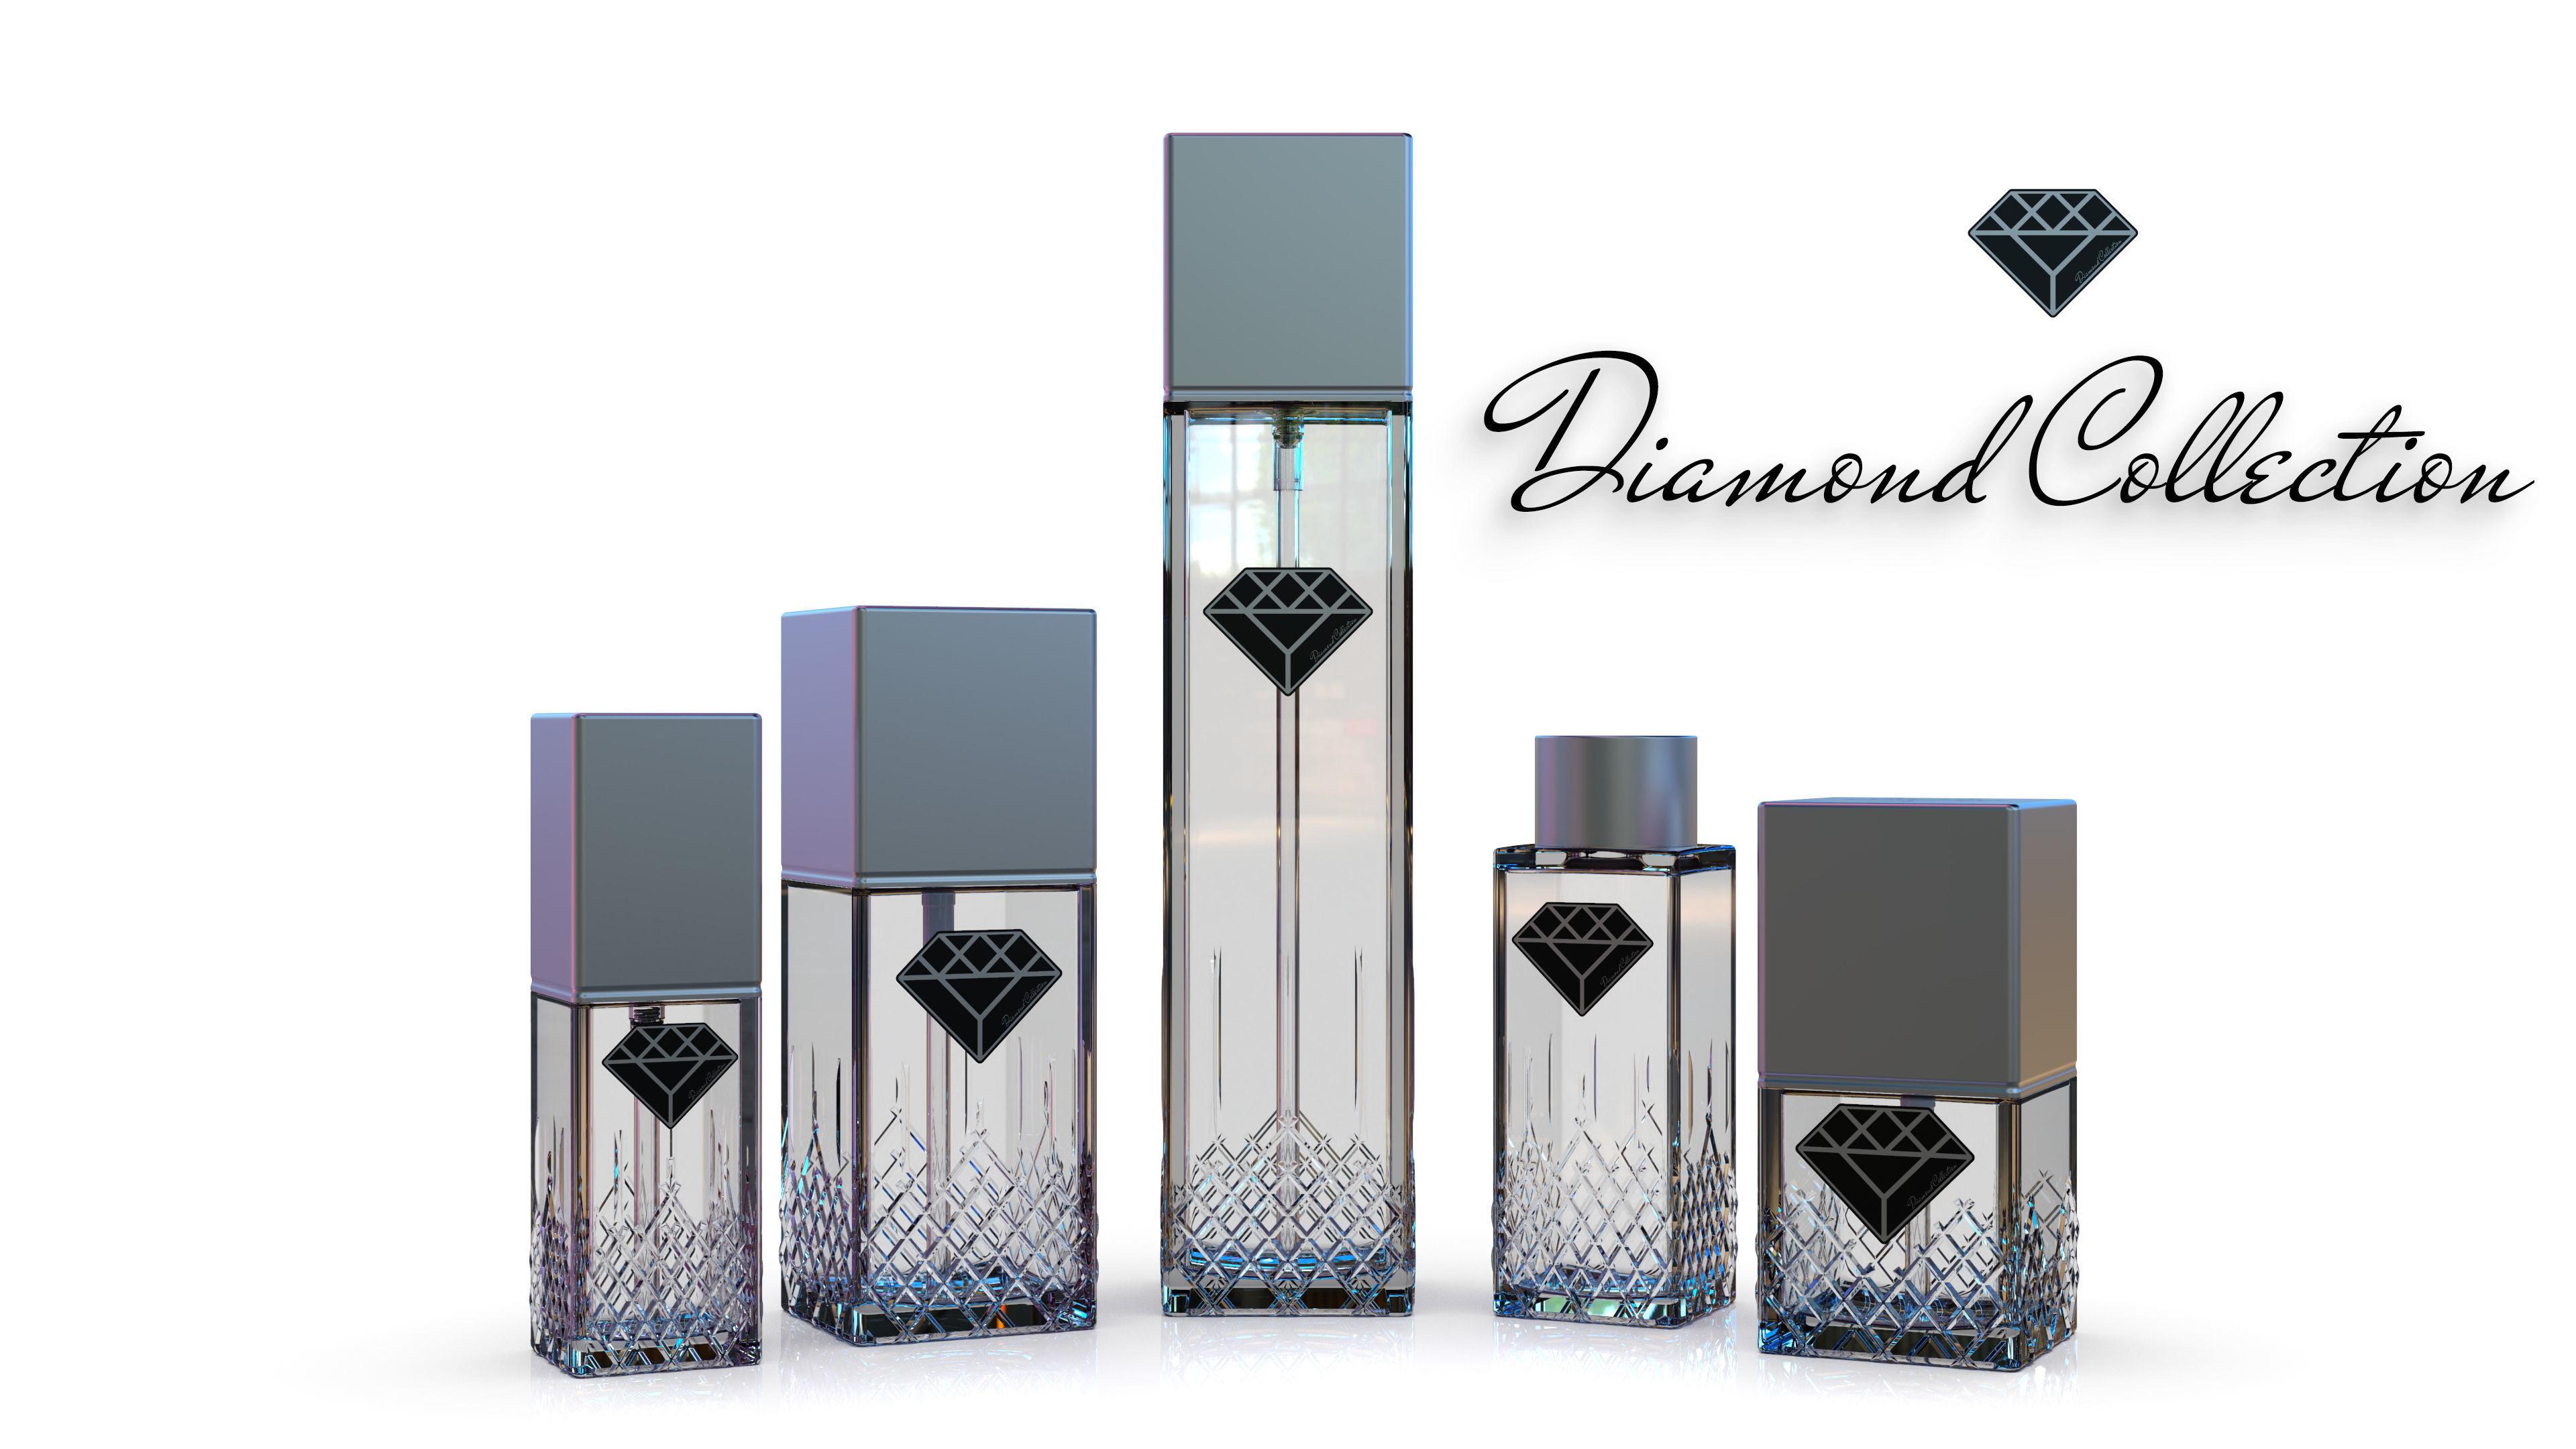 Diamond Collection cosmetics bottles